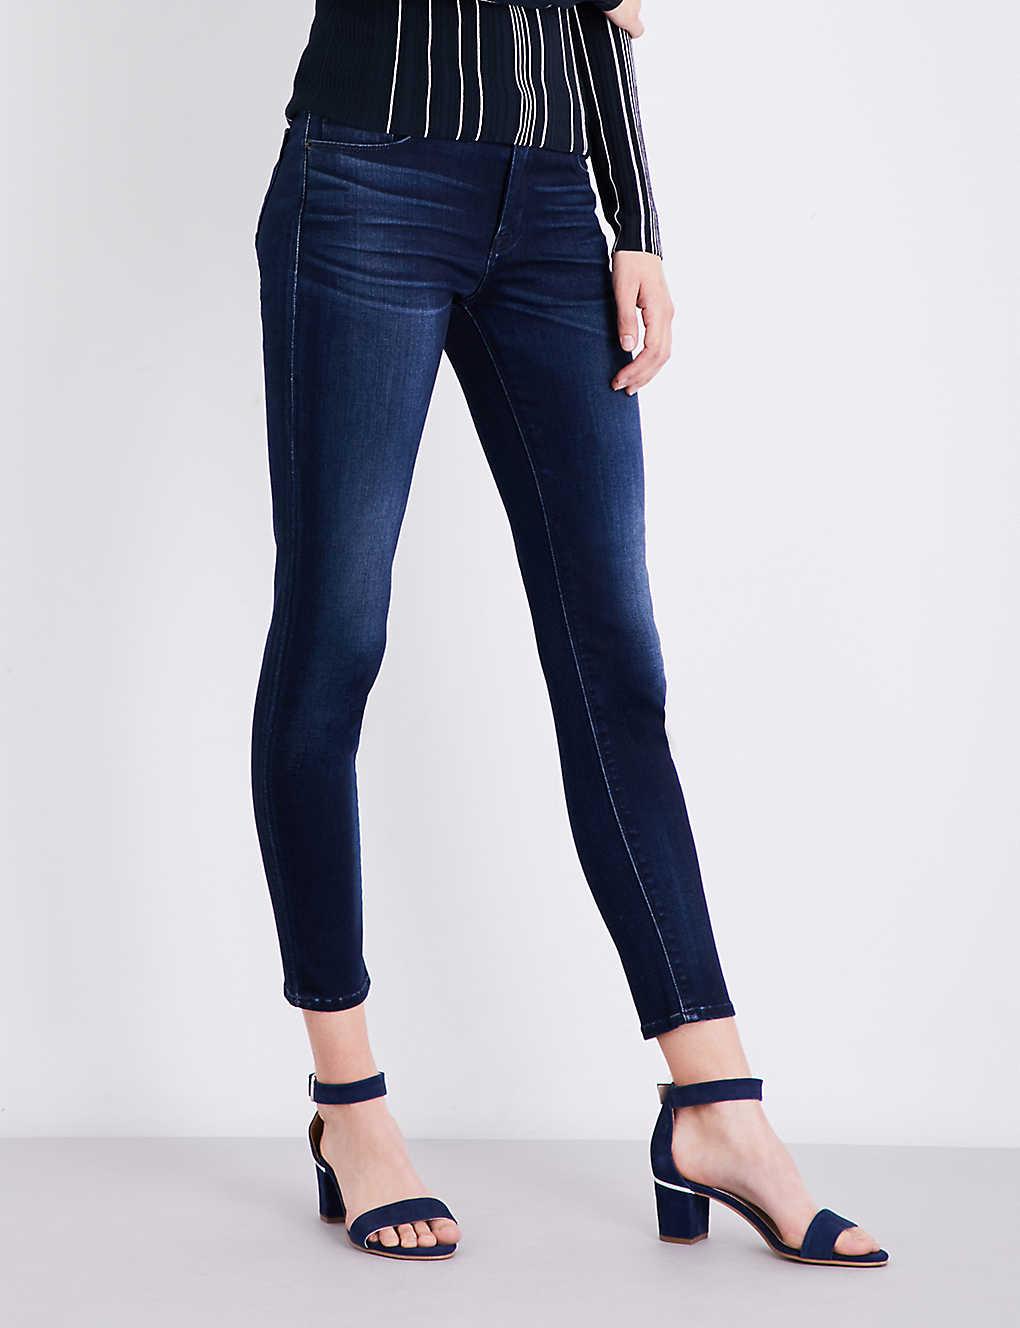 8d26b7c2 HUDSON JEANS - Krista super-skinny mid-rise jeans | Selfridges.com